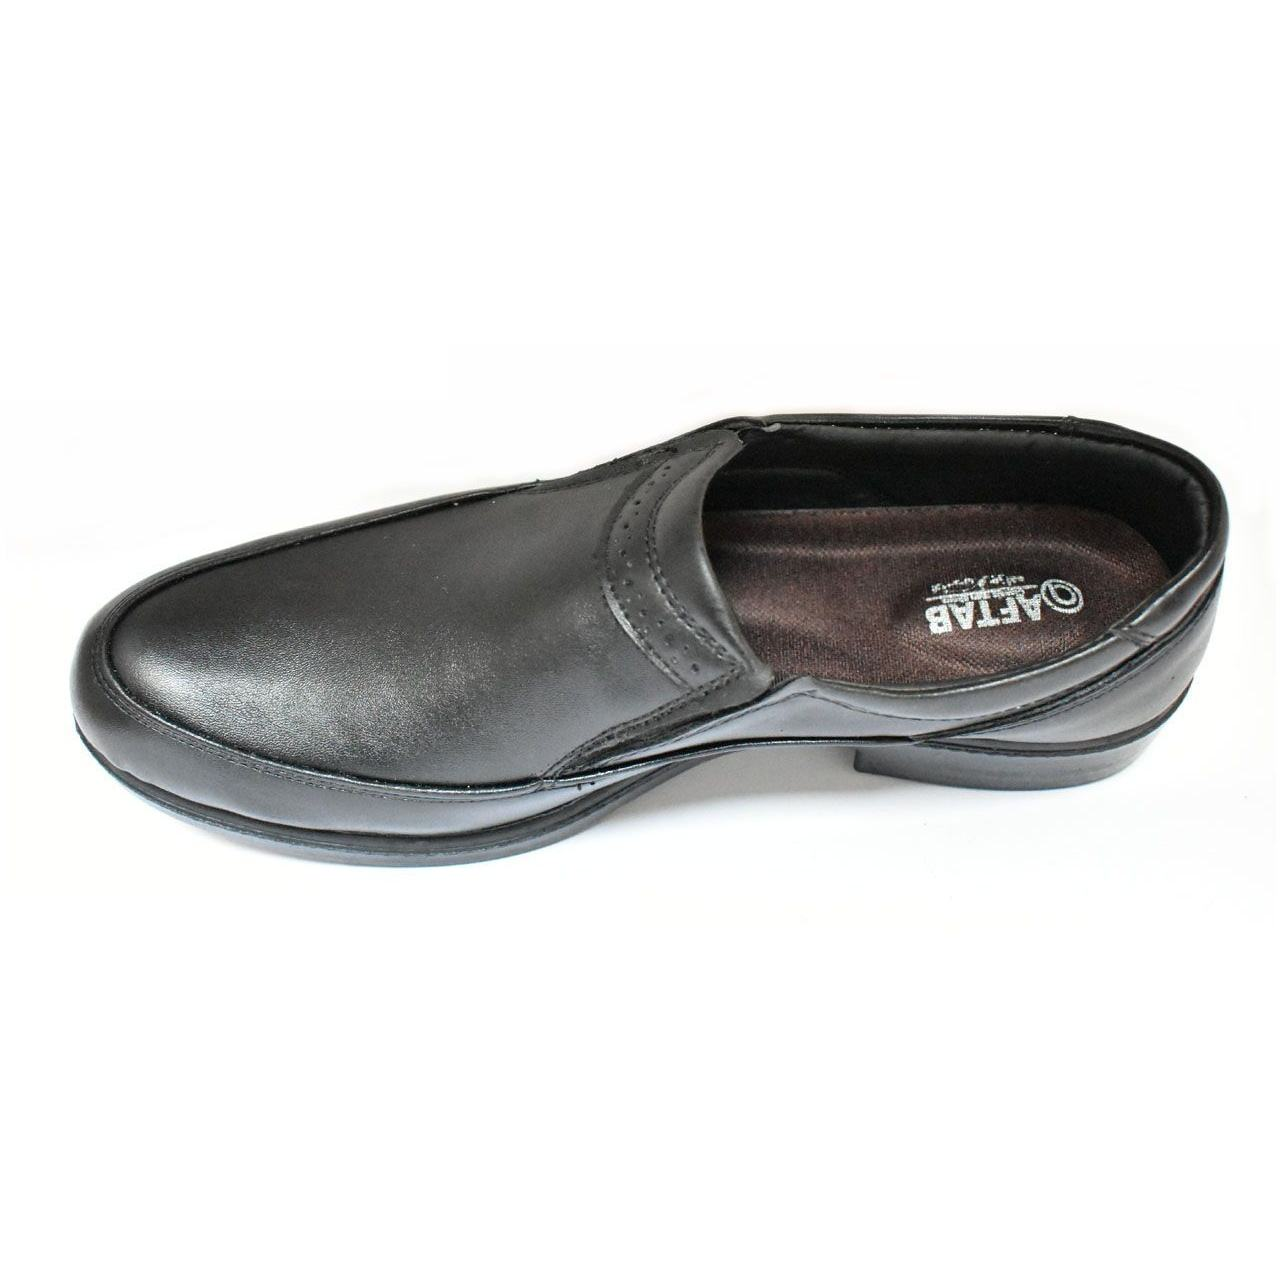 کفش مردانه آفتاب کد 2262